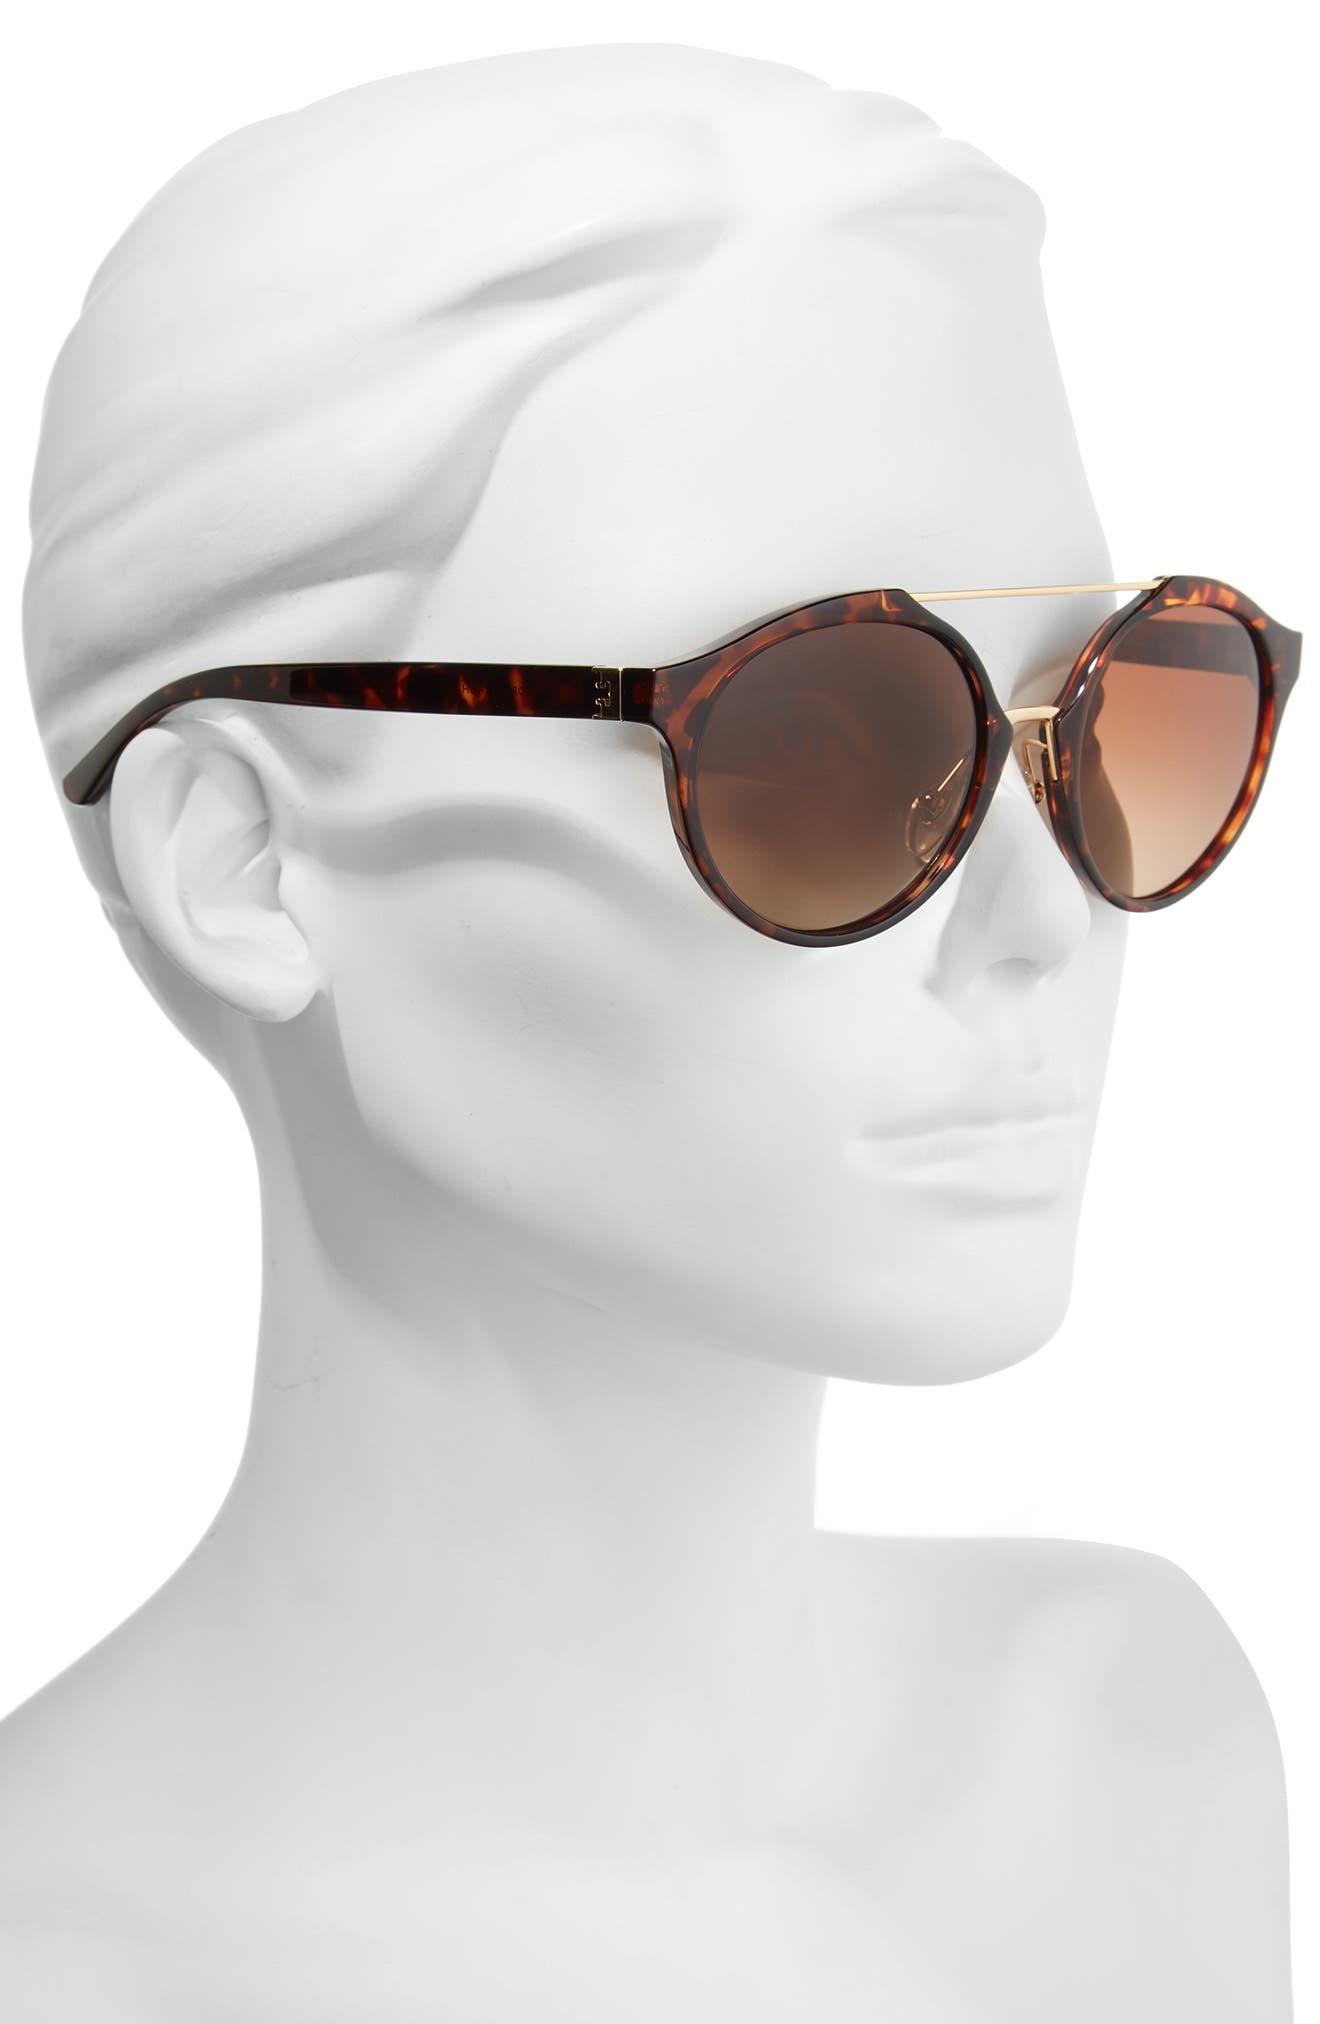 54mm Polarized Sunglasses,                             Alternate thumbnail 2, color,                             Tortoise/ Polar